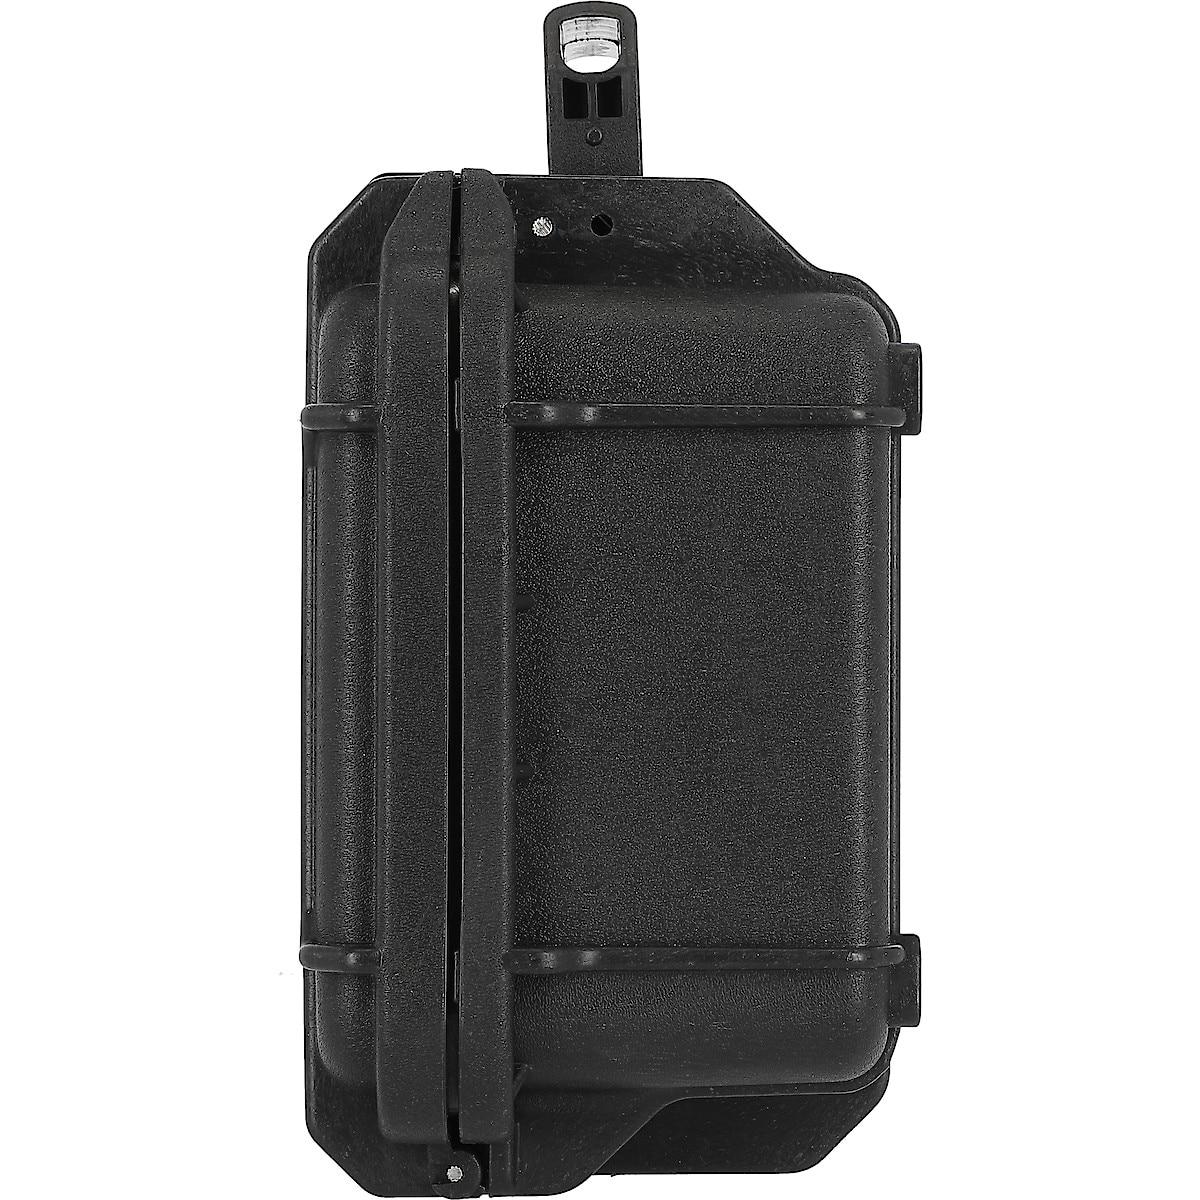 Laukku vesi- ja pölytiivis, IP65